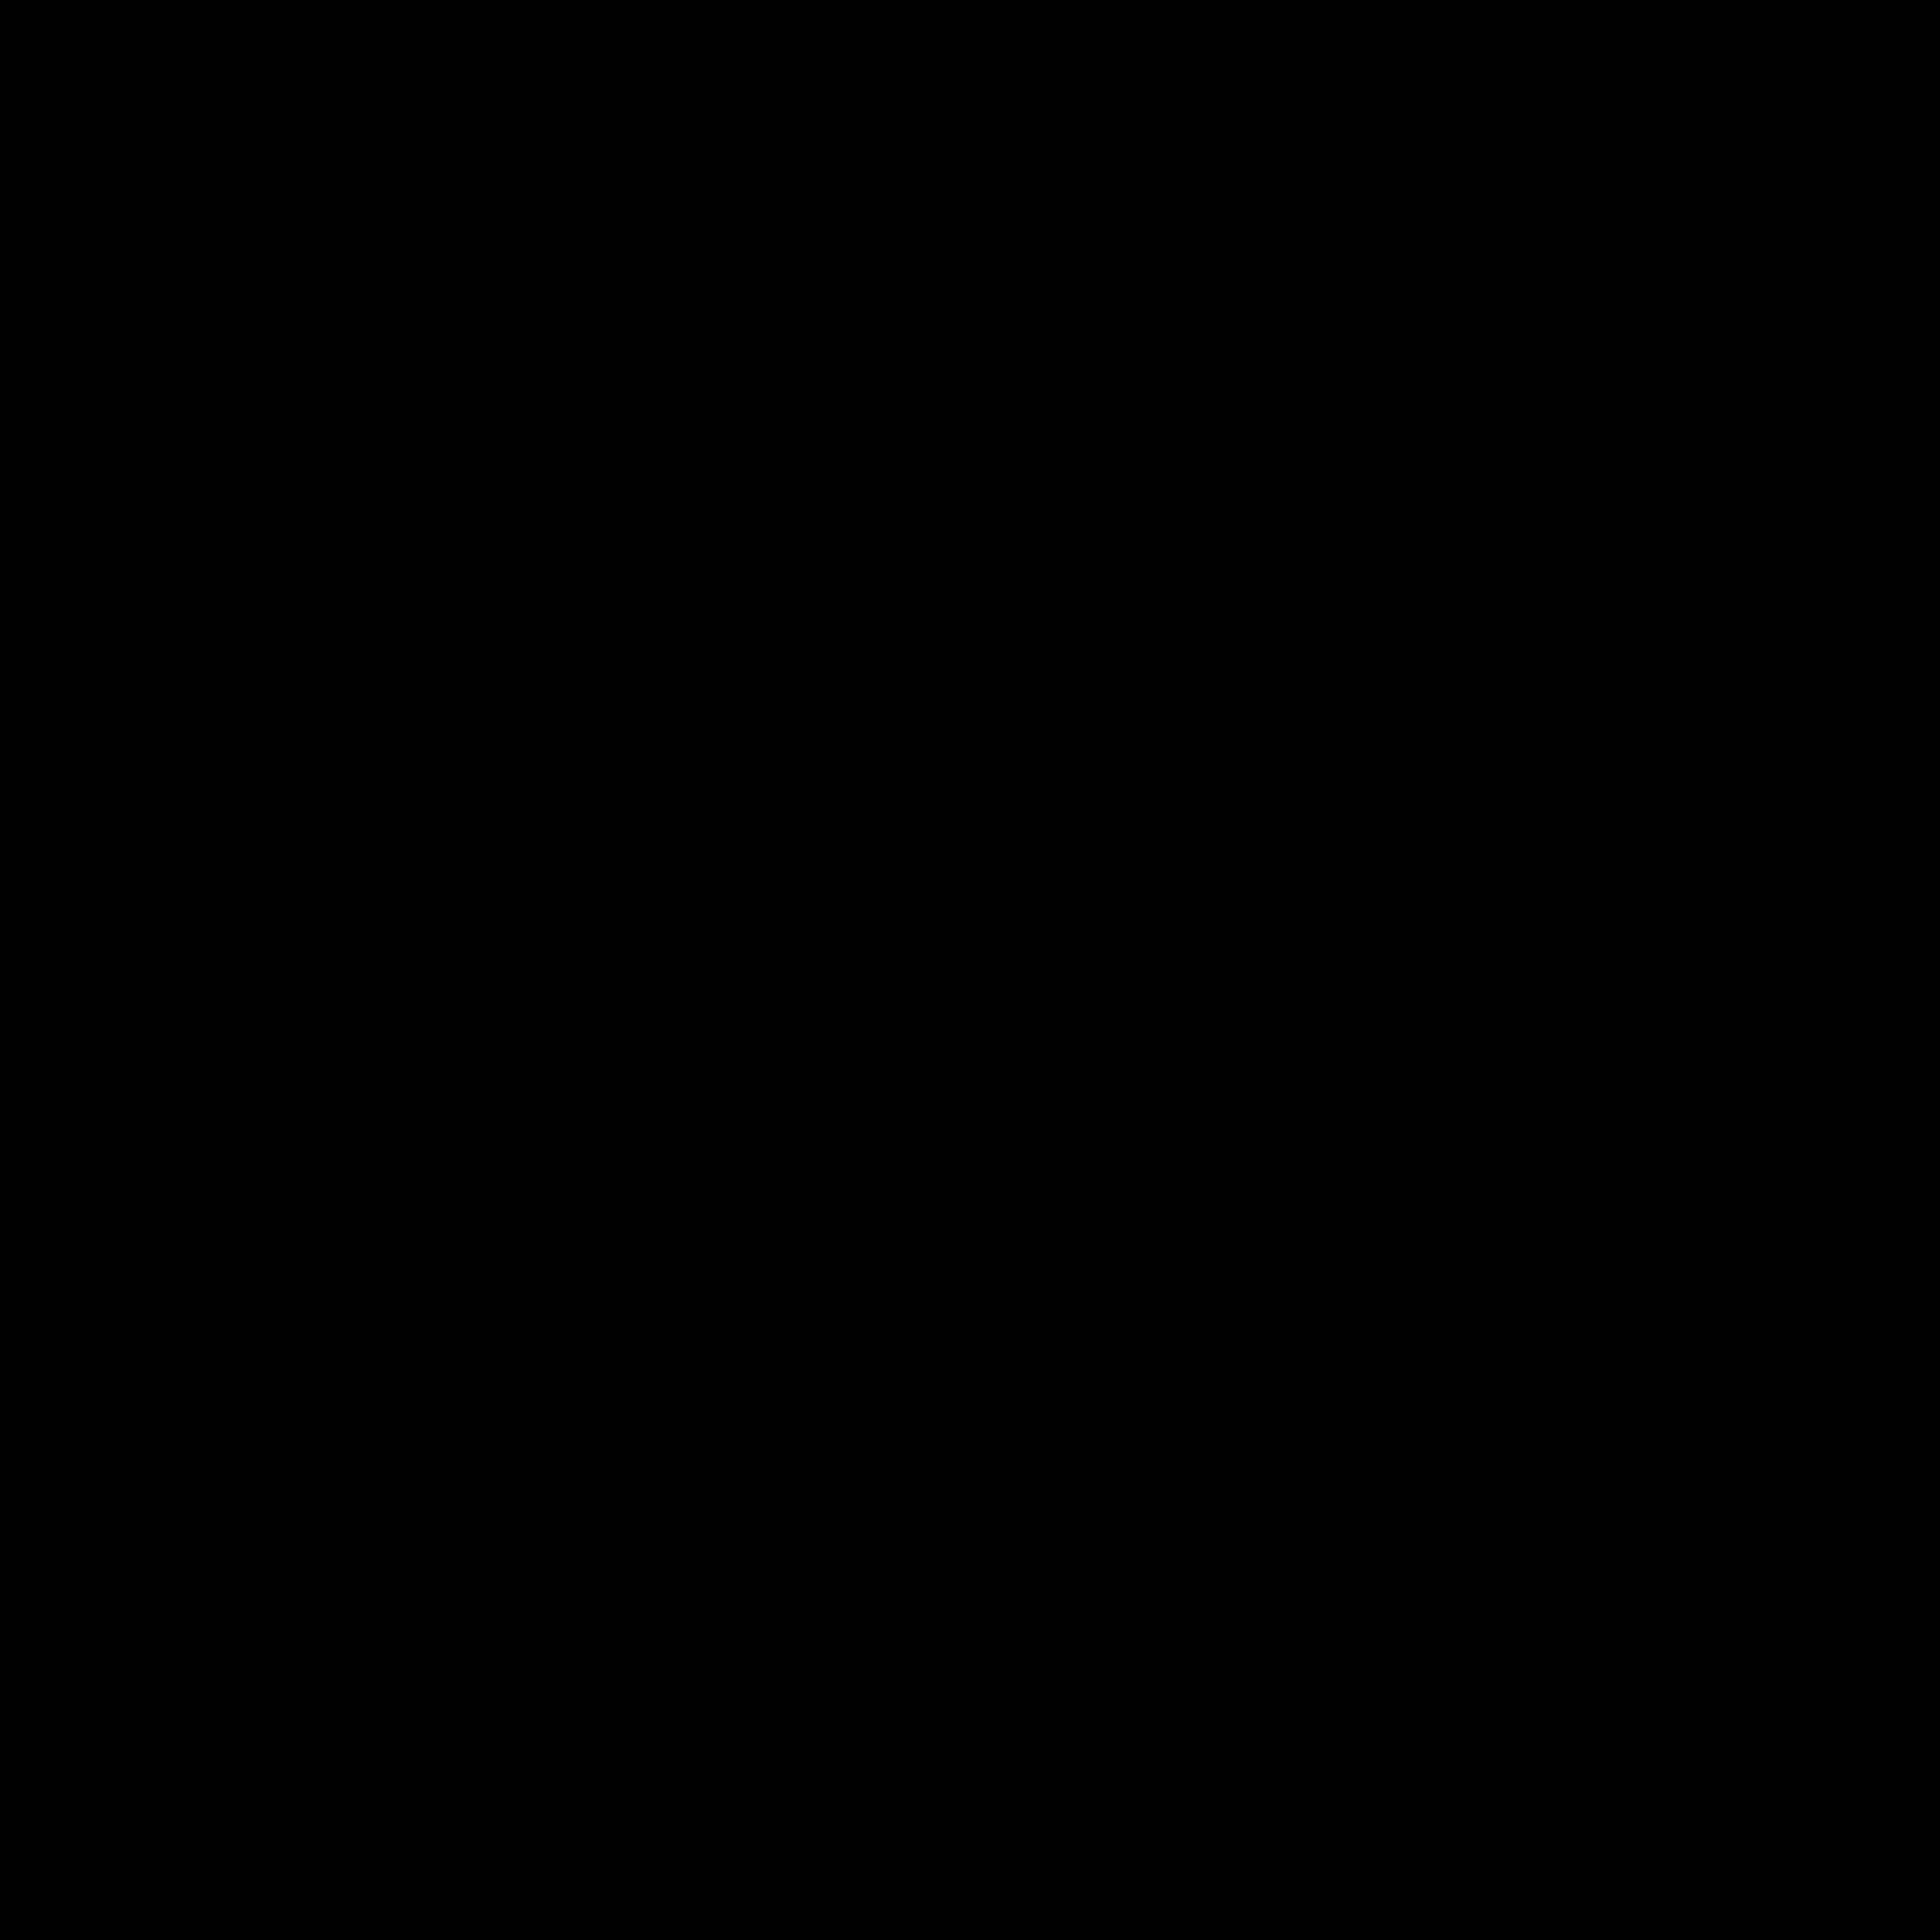 Philadelphia 76Ers Logo Stencil Philadelphia 76Ers Logo.